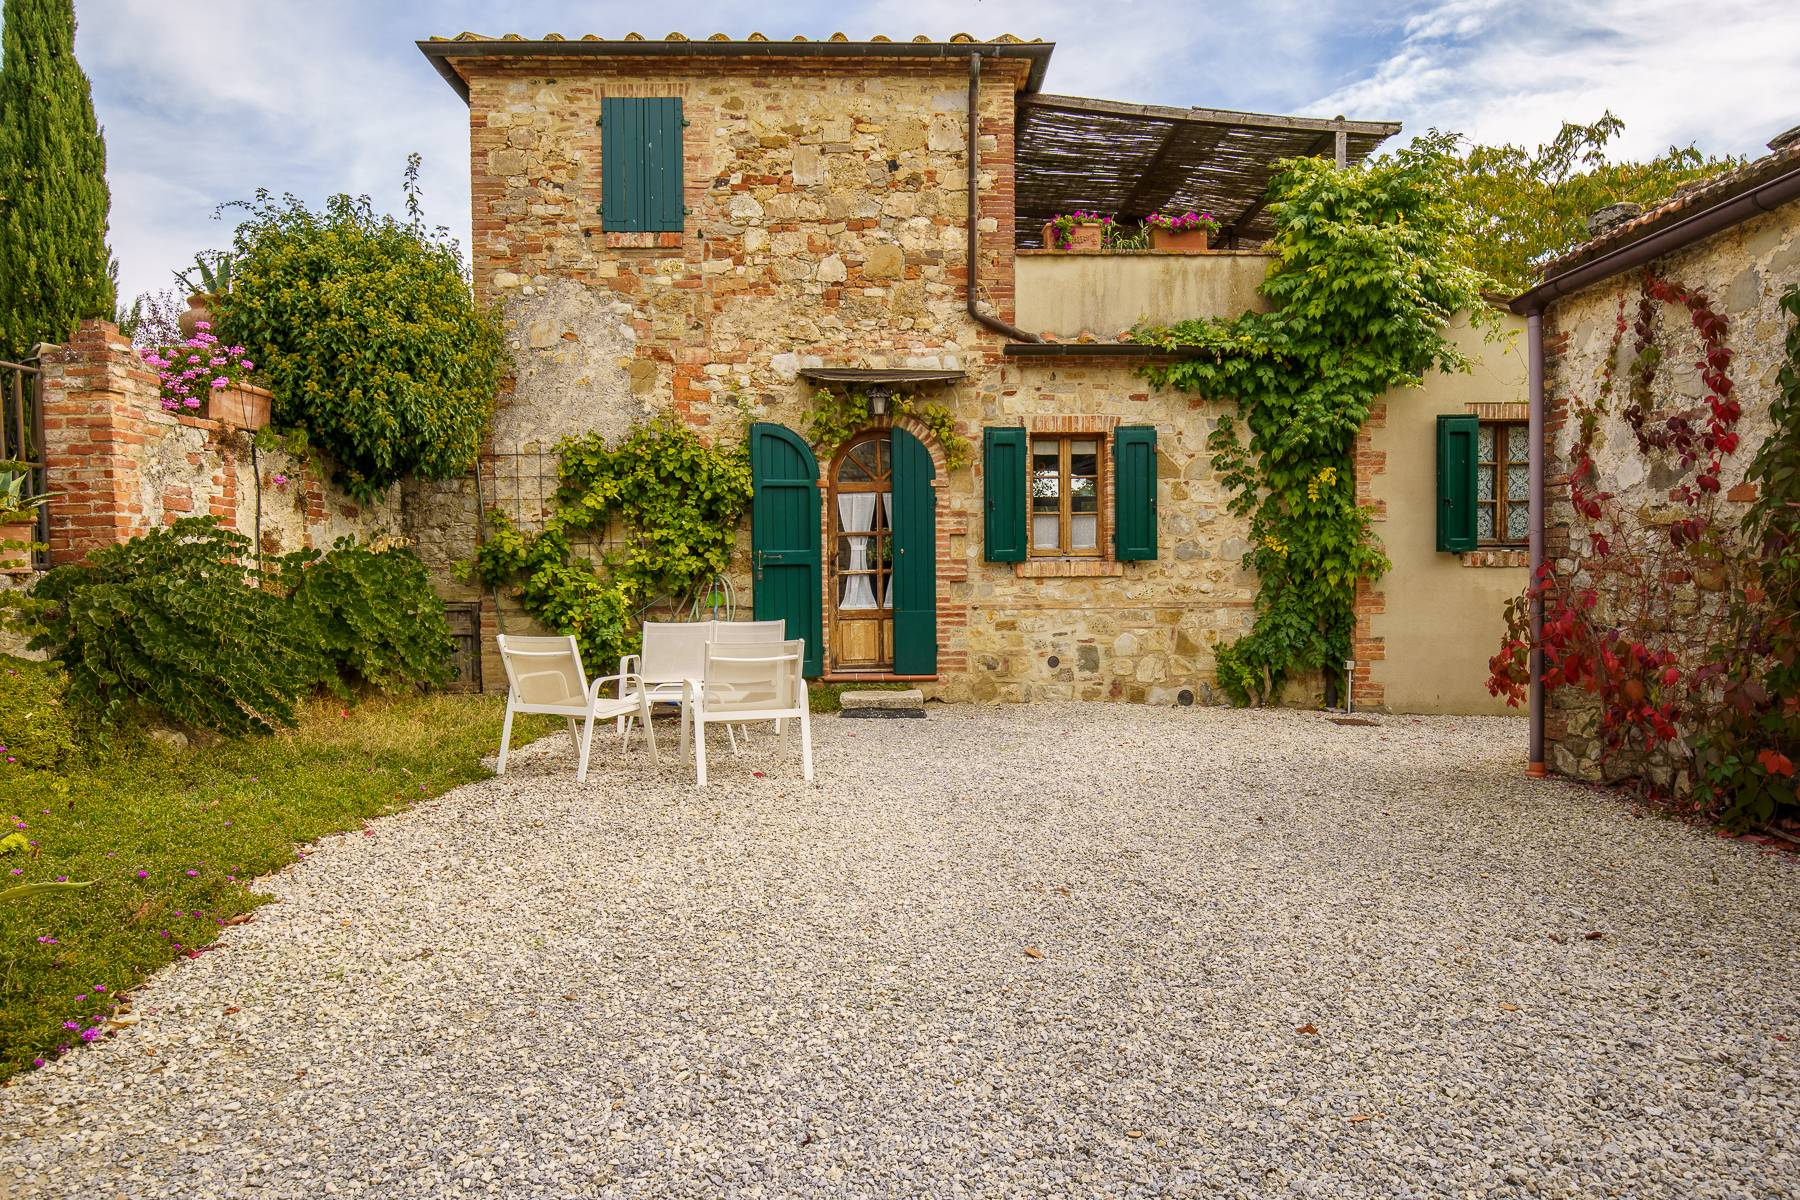 Organic winery in the heart of Crete Senesi - 7